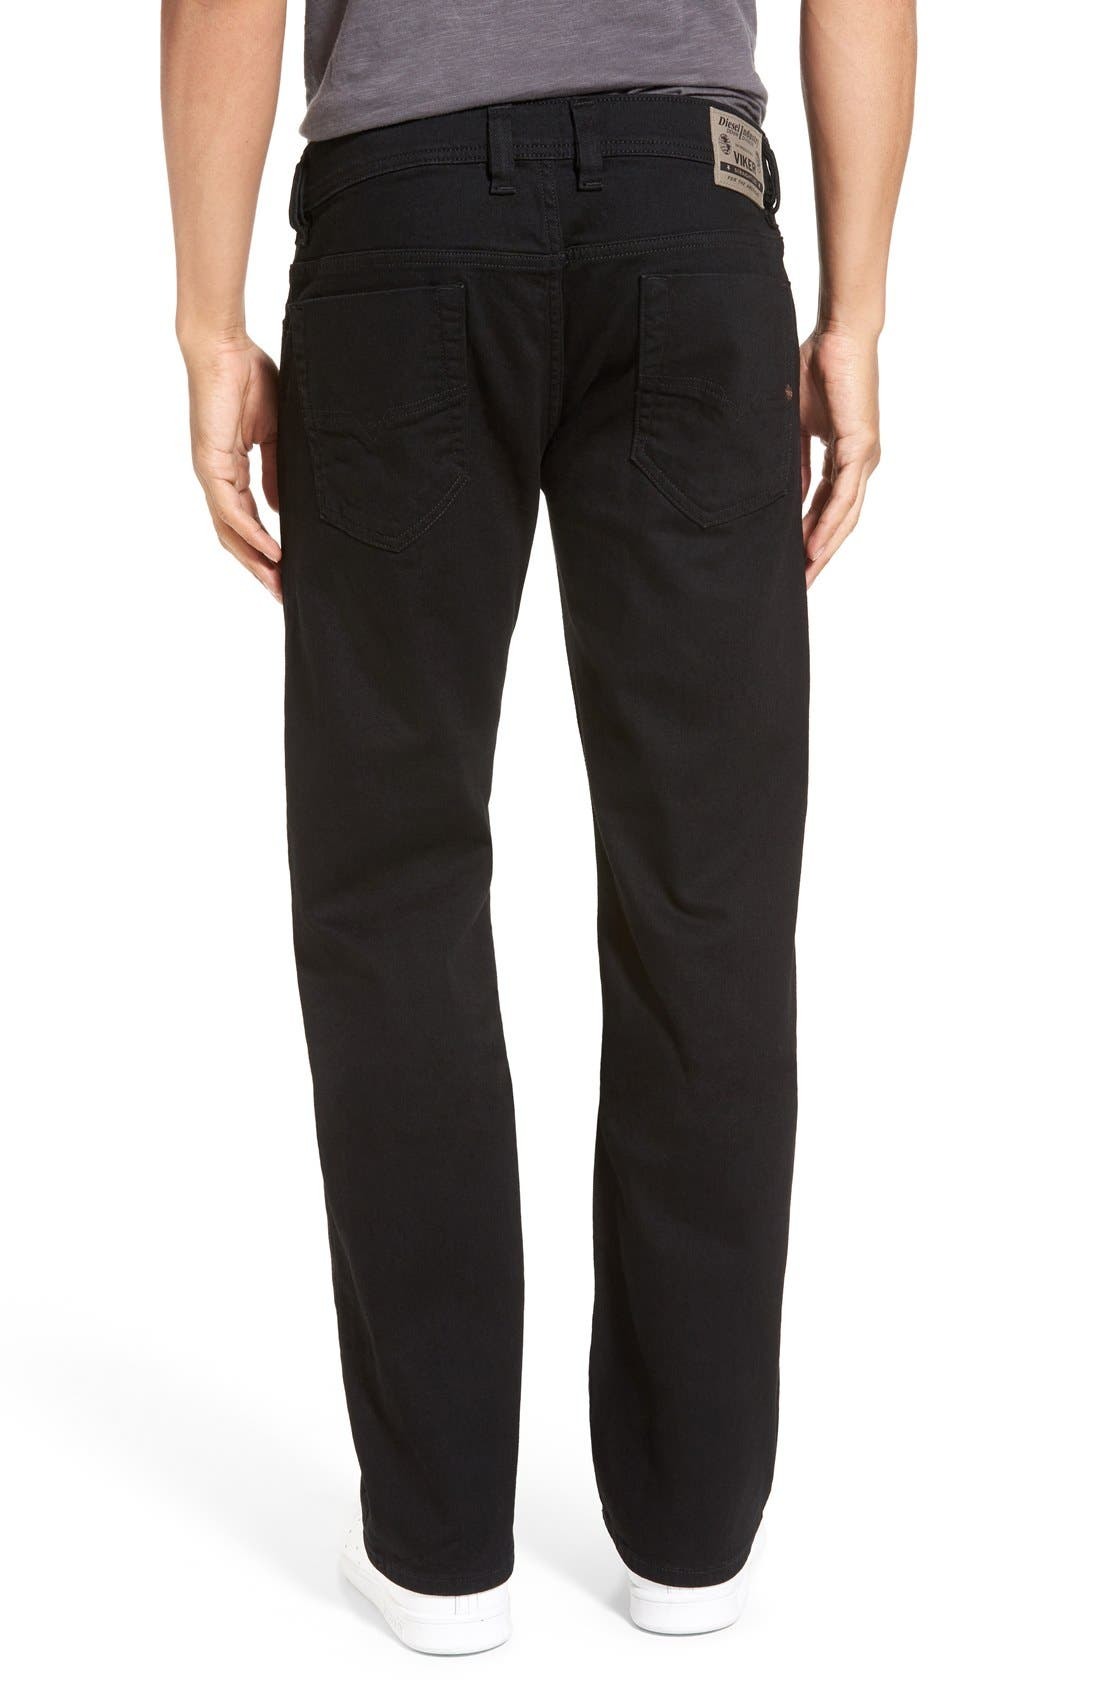 'Viker' Straight Fit Jeans,                             Alternate thumbnail 3, color,                             008